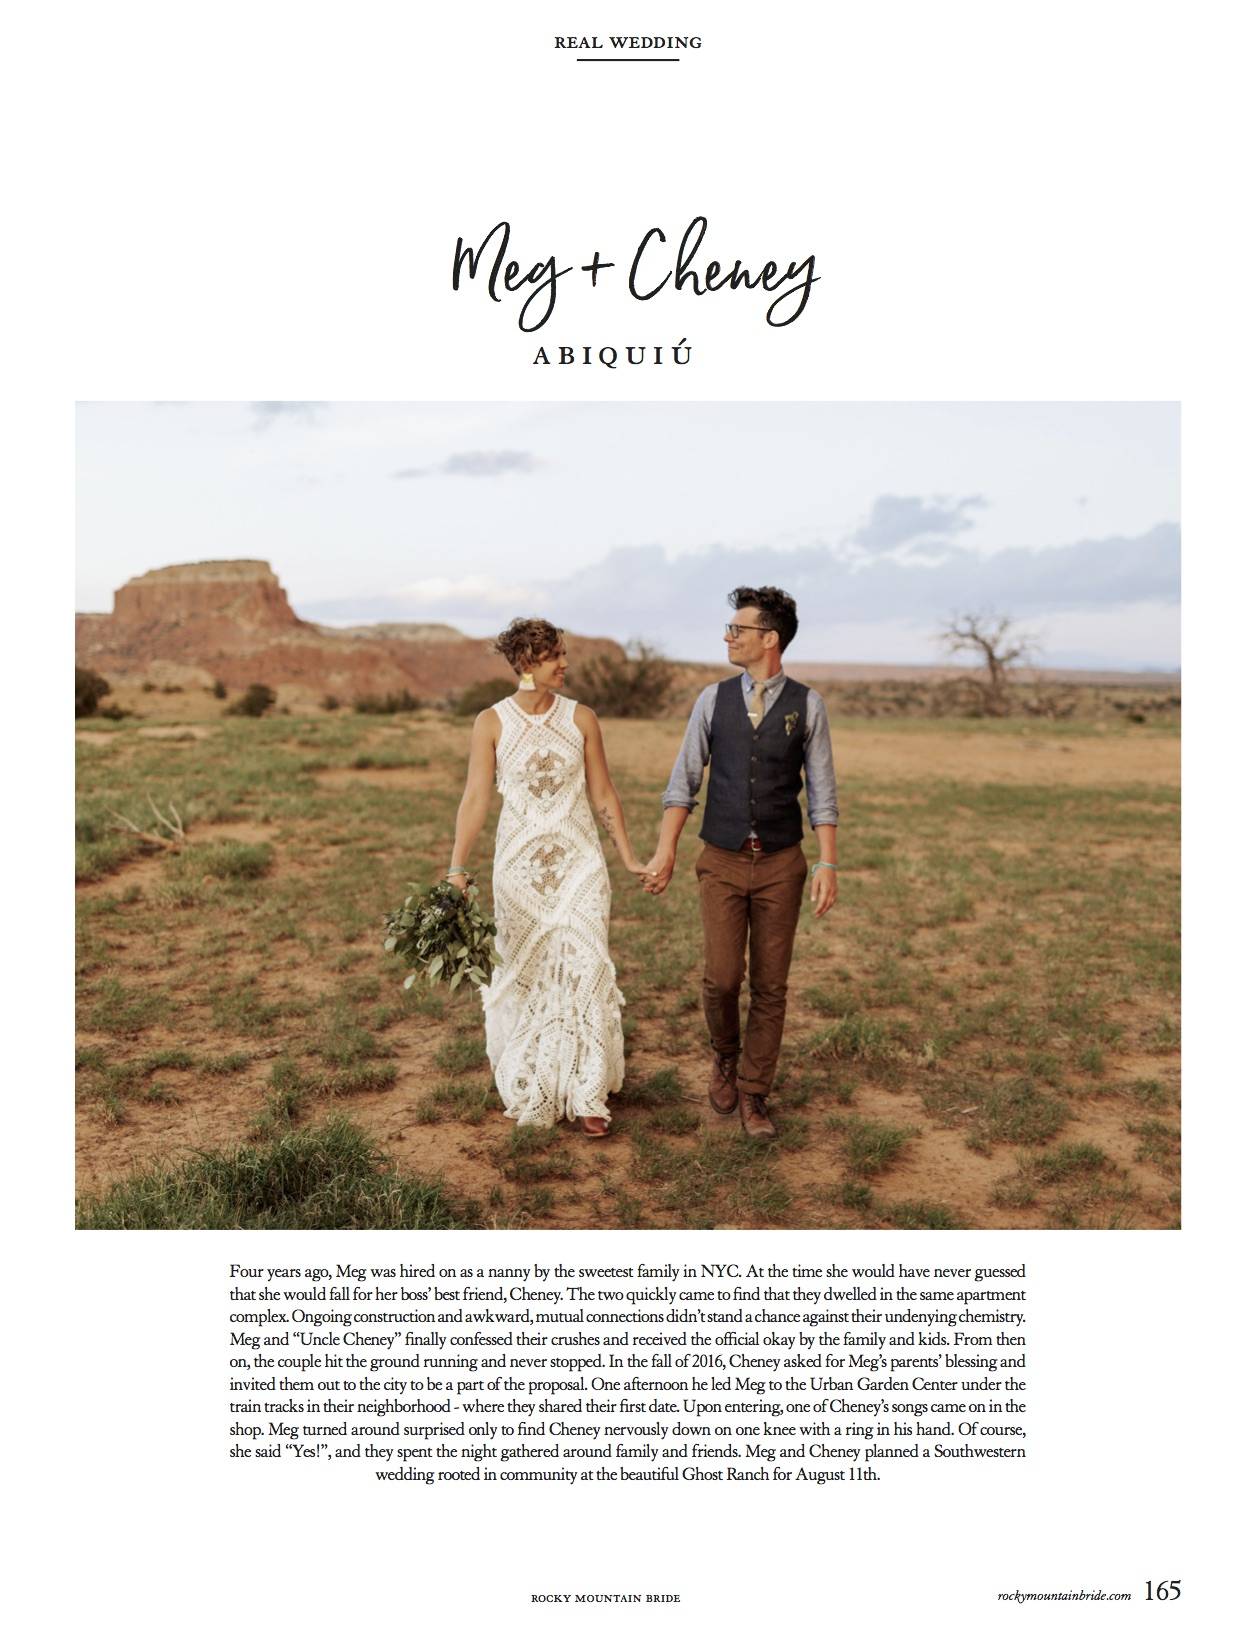 Abique Wedding, Santa Fe wedding, New mexico wedding, airbrush Santa fe